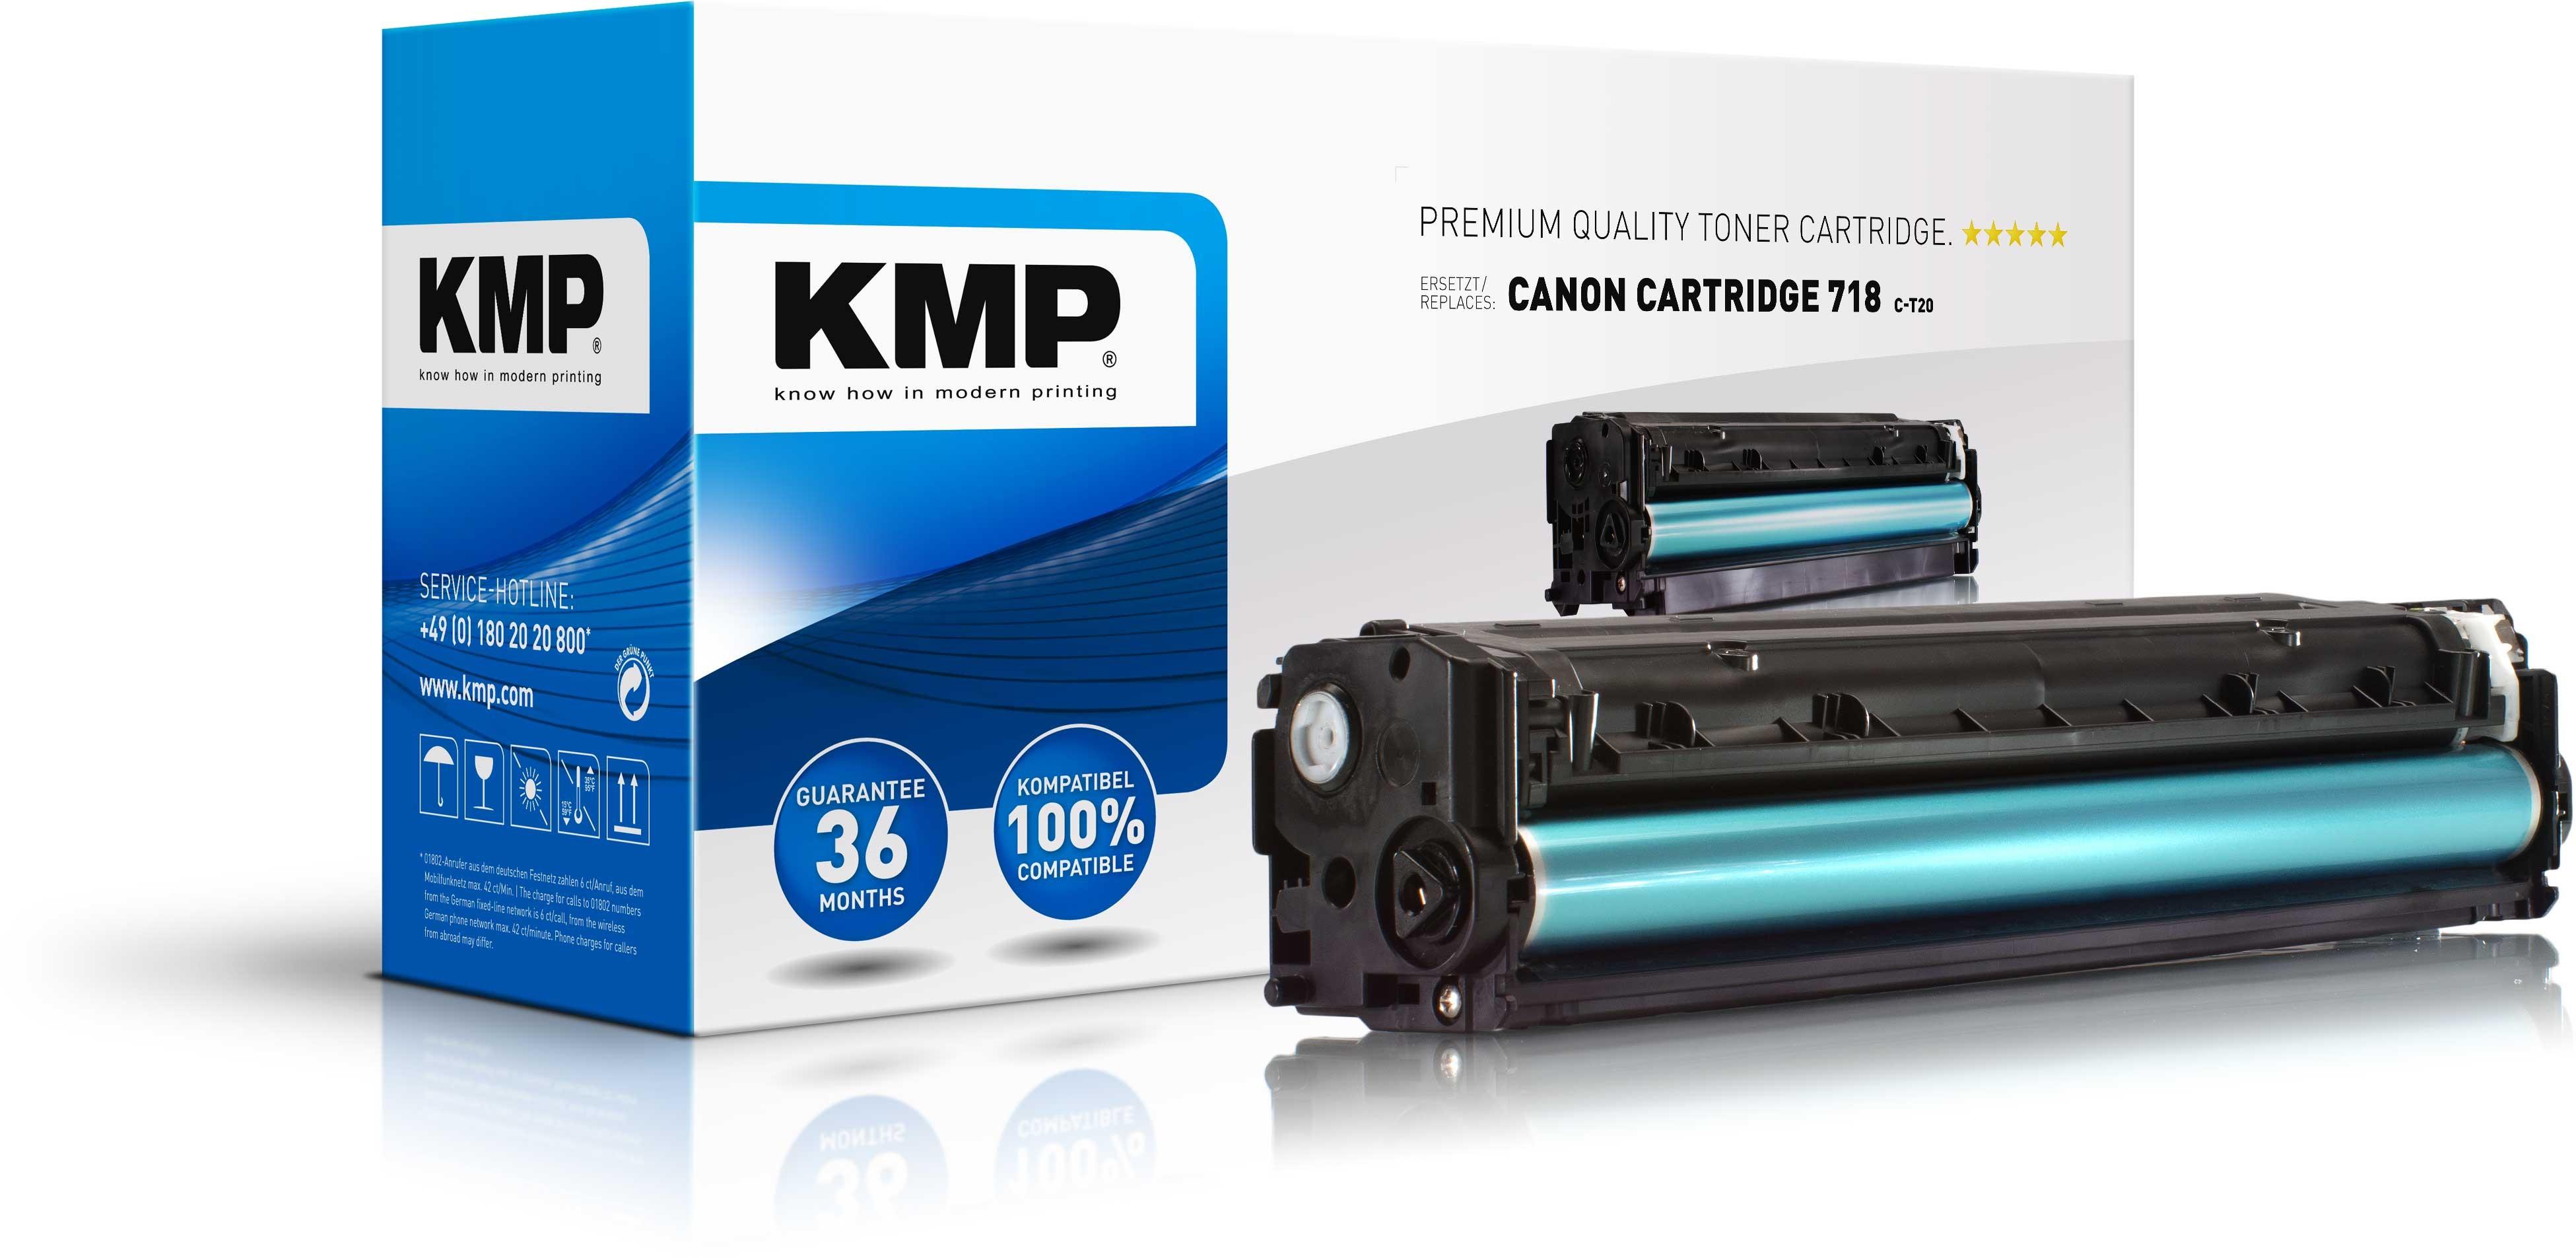 KMP Toner für Canon Cartridge 718 I-Sensys LBP-7200C cyan C-T20